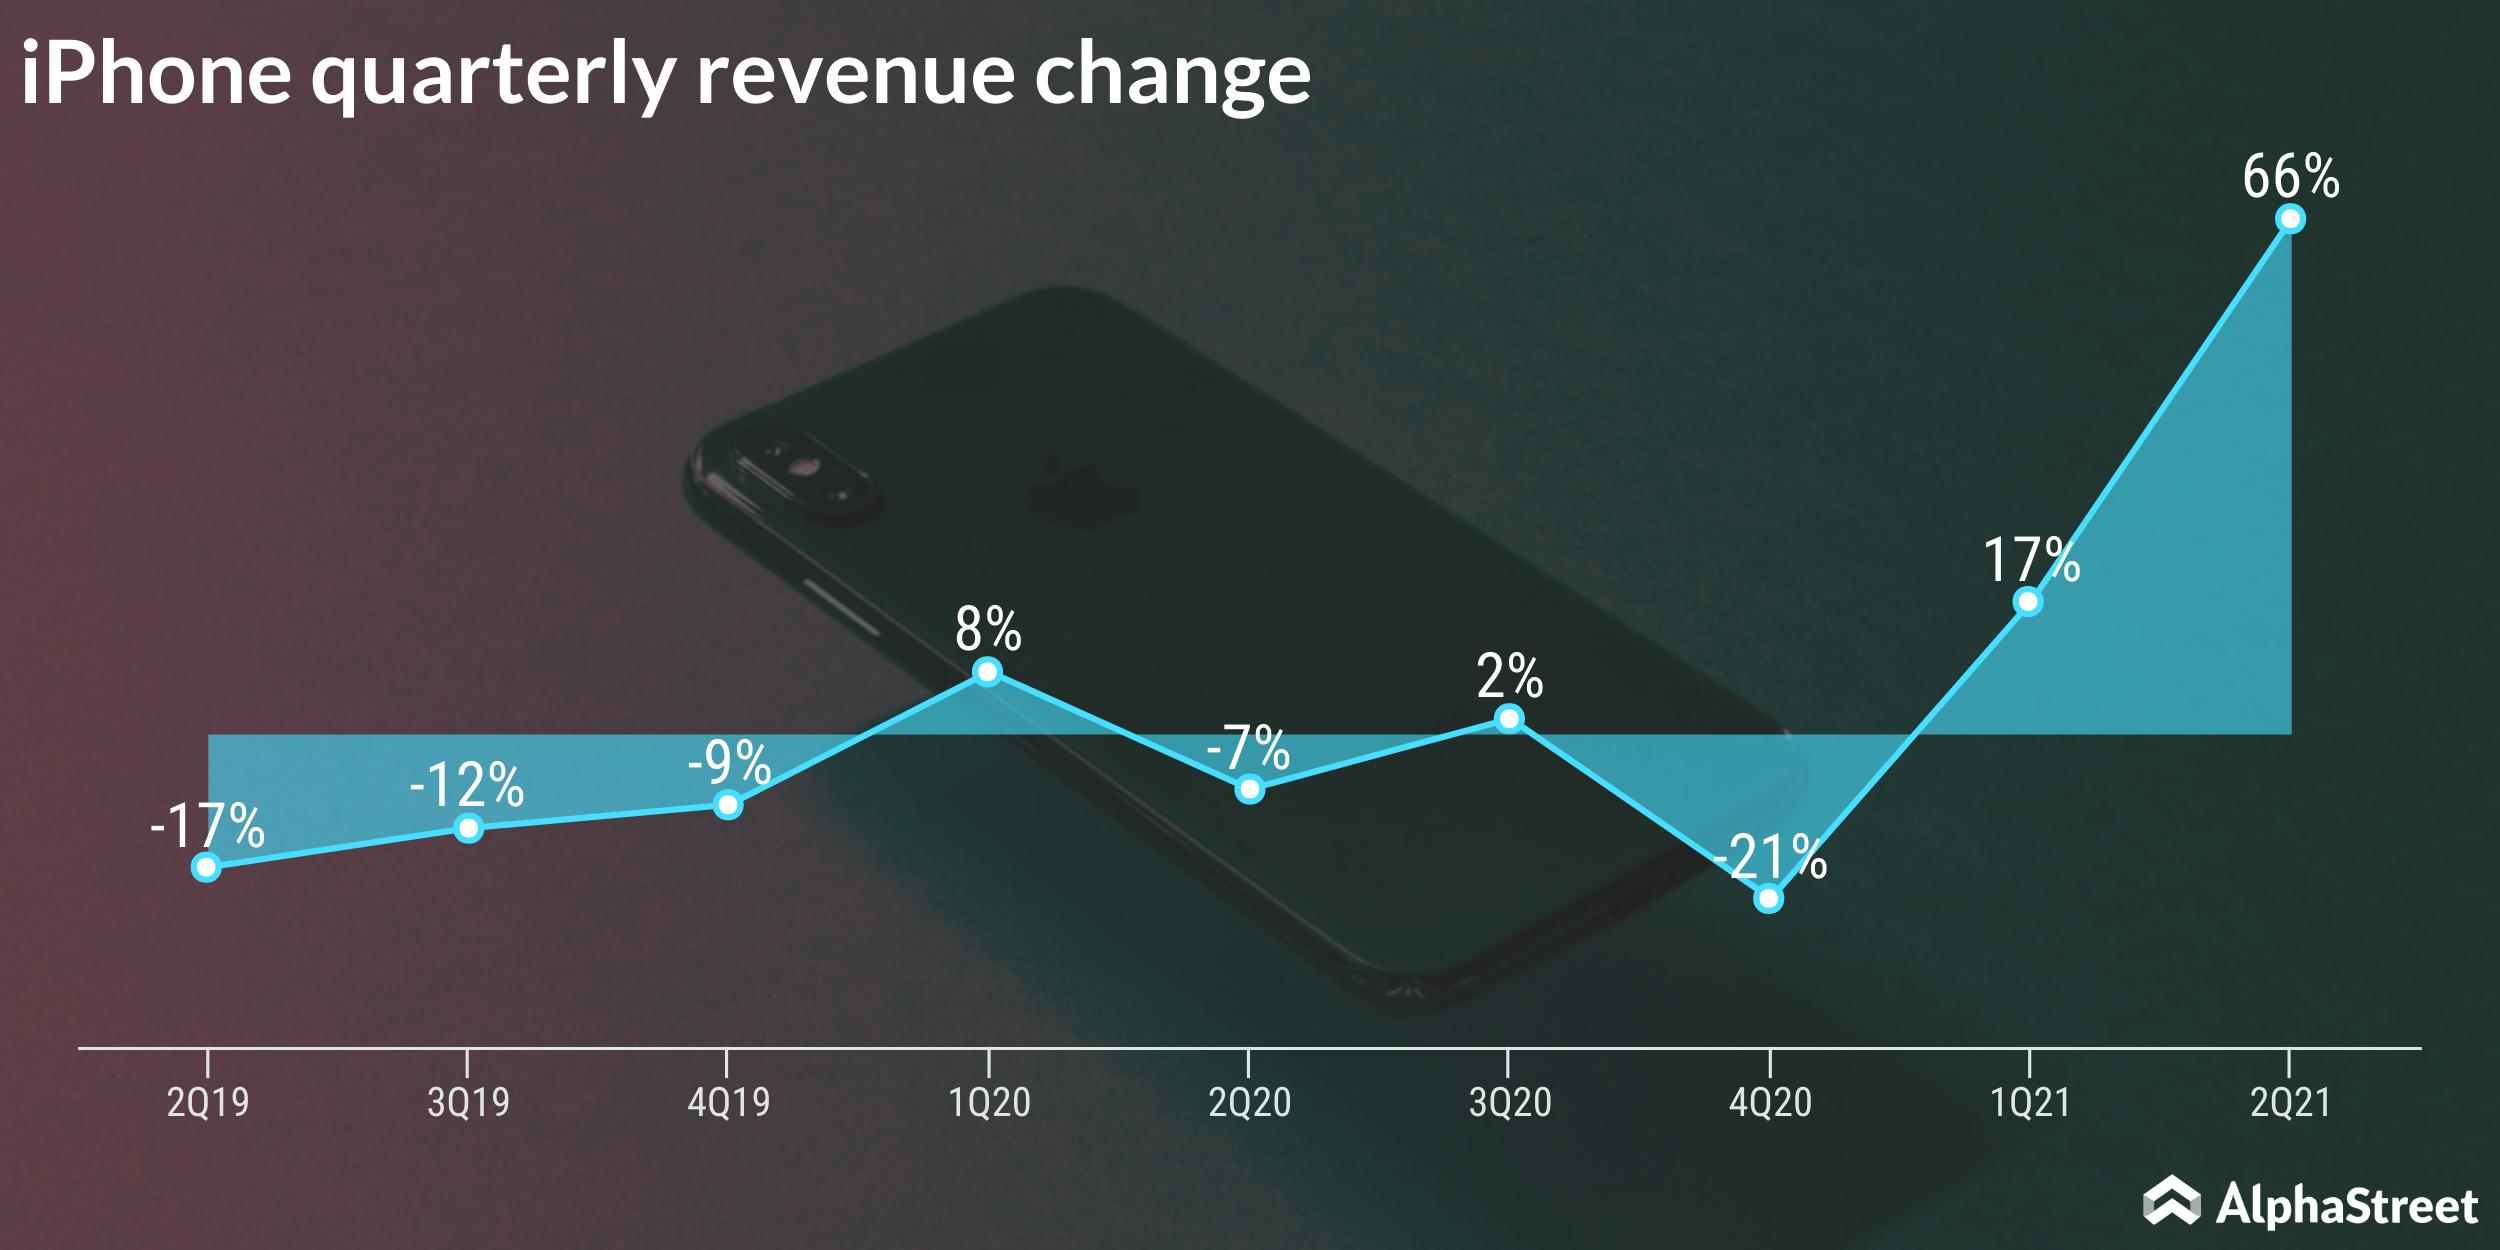 iPhone quarterly sales performance